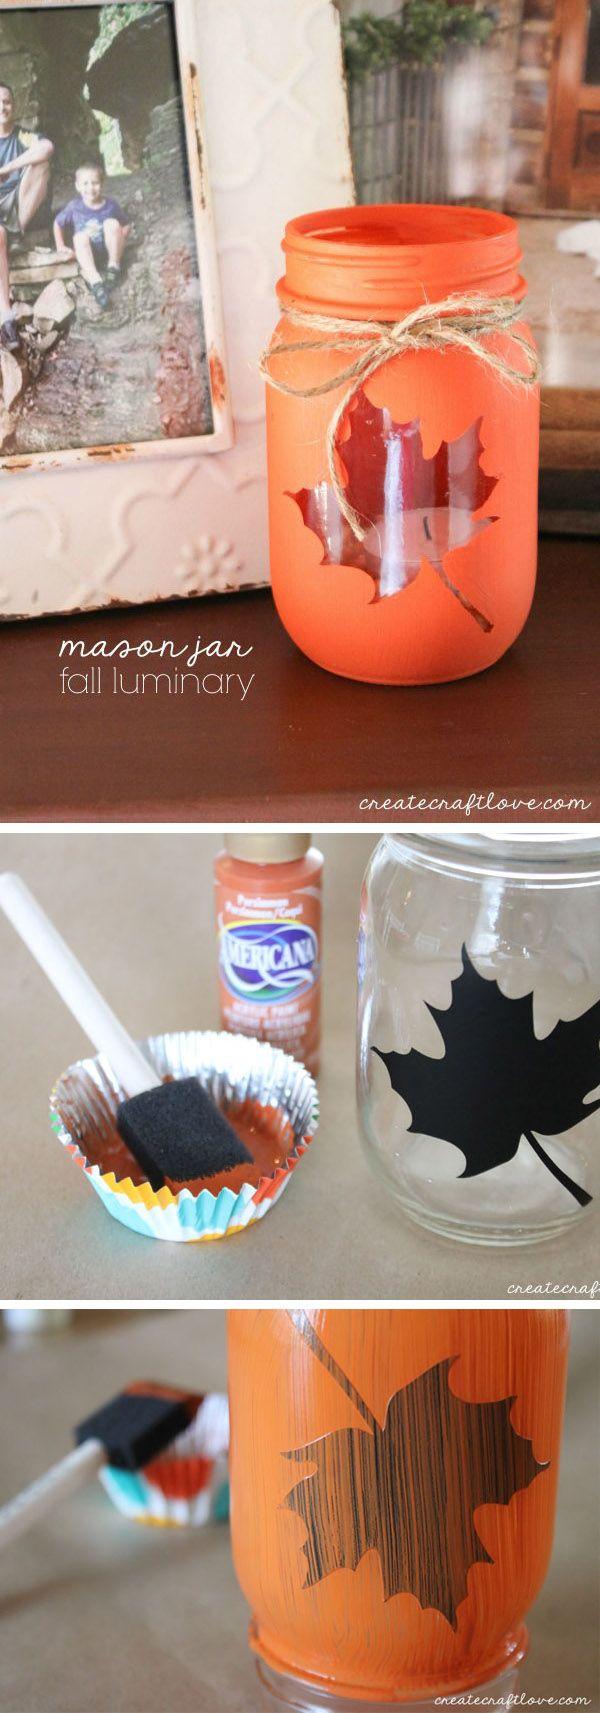 Ten Inspirational DIY Mason Jar Ideas for Weddings  Mason jar